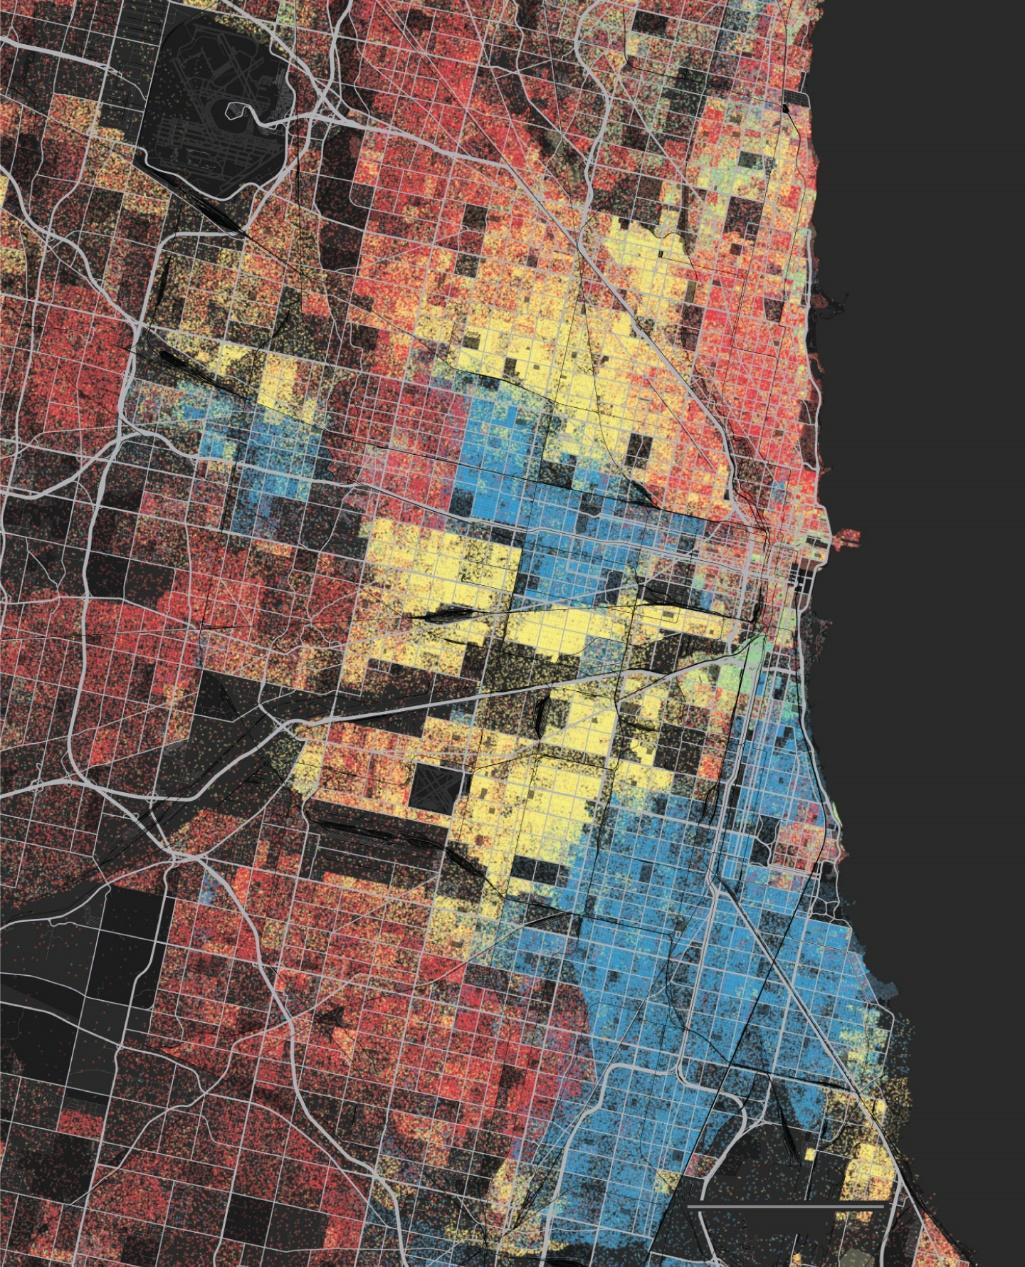 https://www.washingtonpost.com/graphics/2018/national/segregation-us-cities/img/Chicago_map_2016-720.jpg?c=63